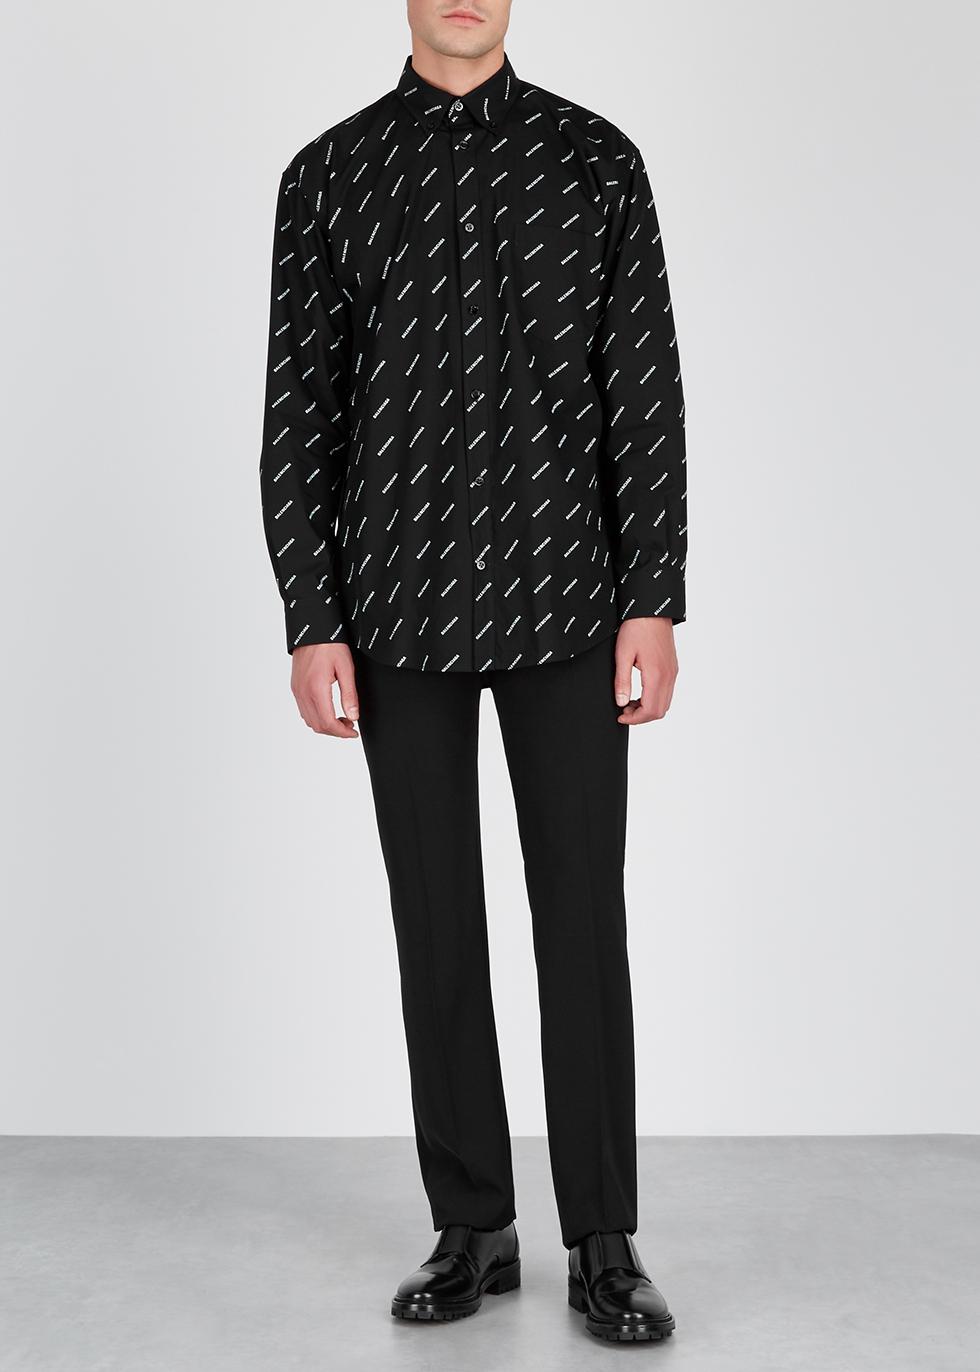 Black skinny twill trousers - Balenciaga